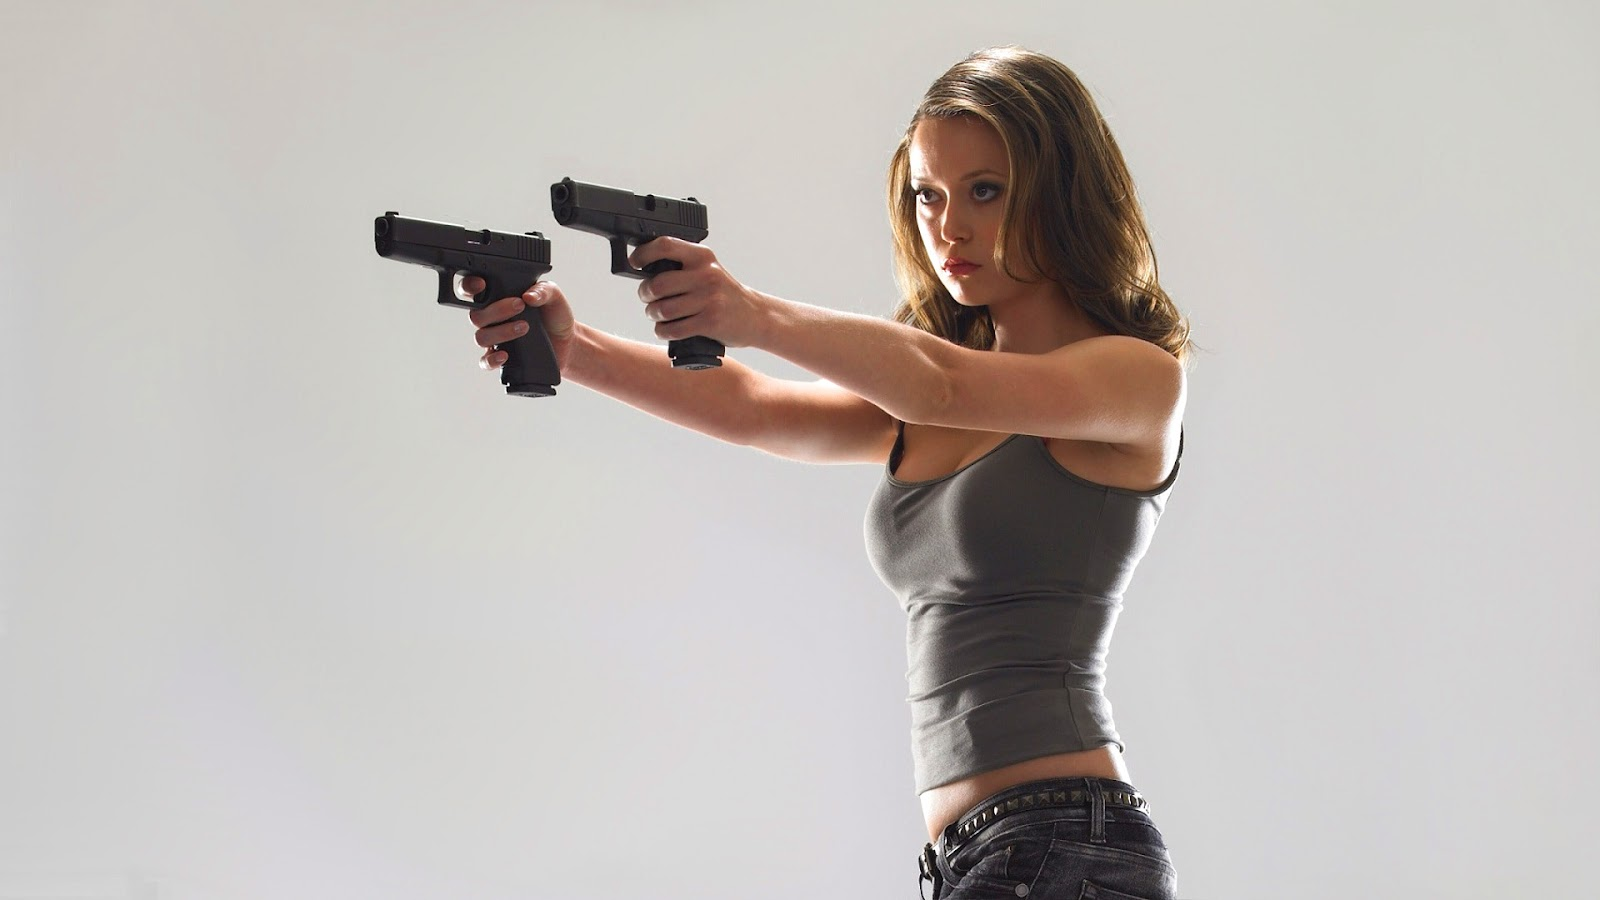 gun girl computer wallpapers - photo #6